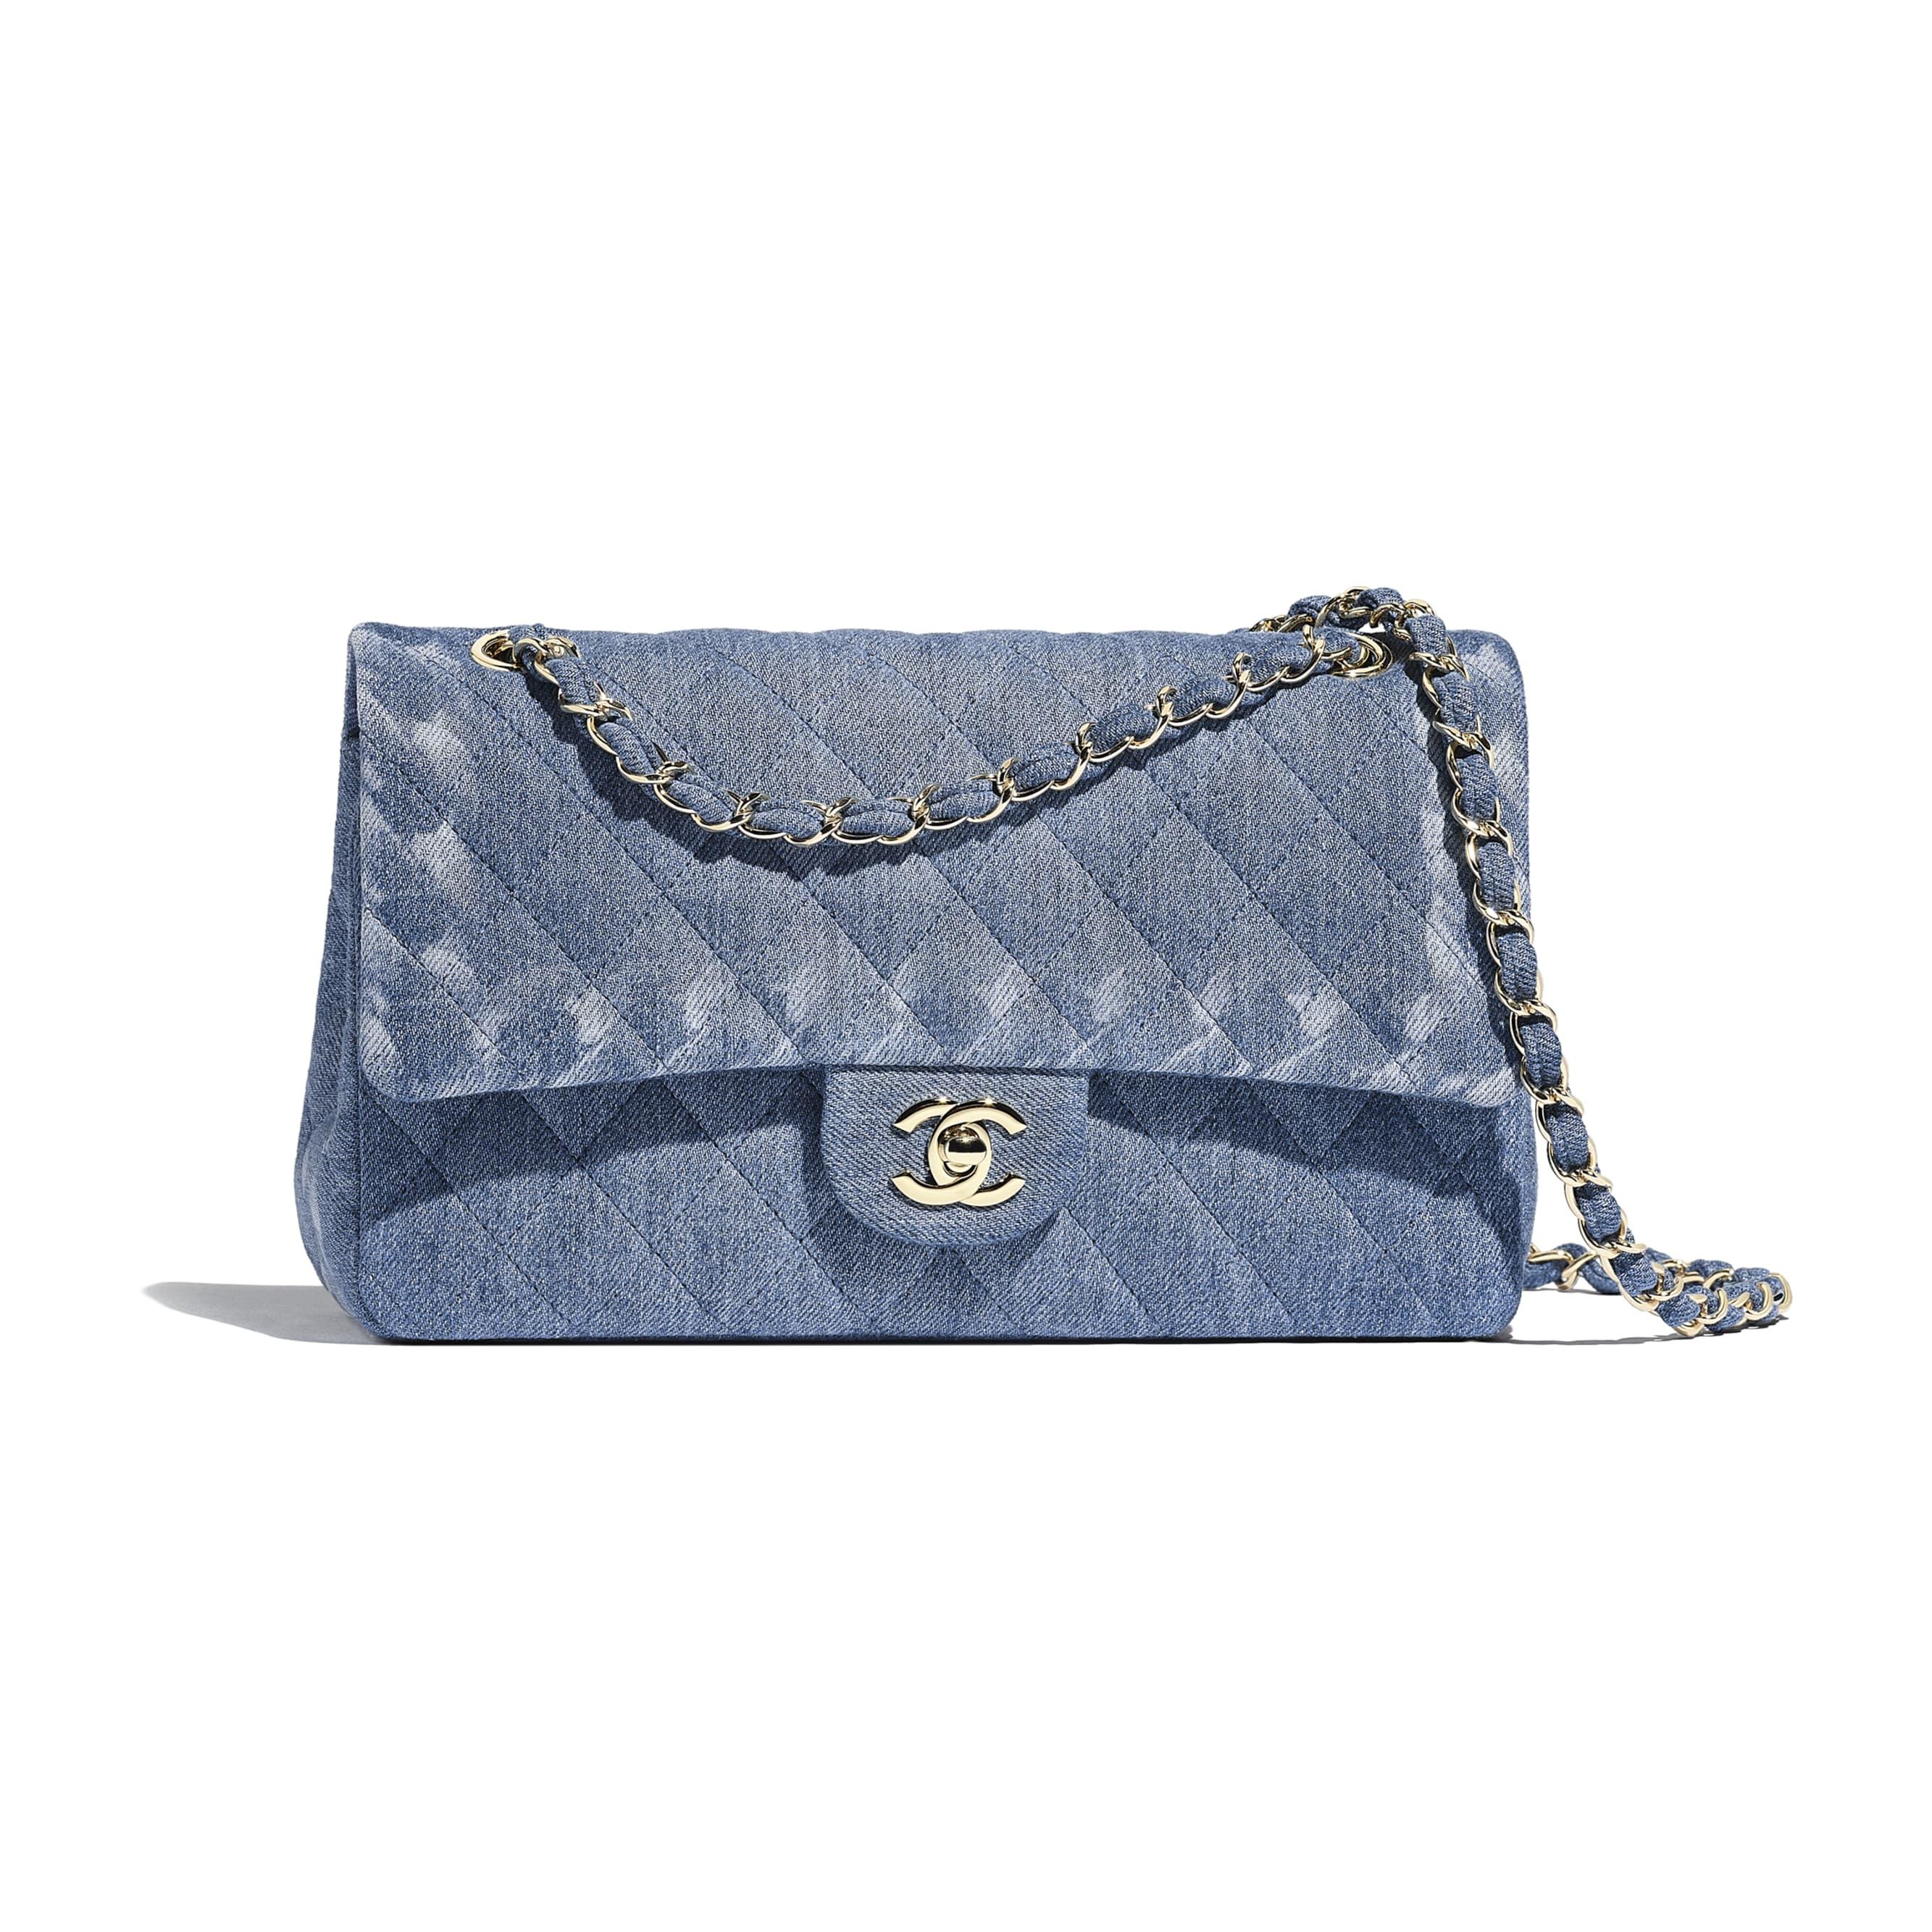 b03cacbcc48a ... Classic Handbag - Blue - Denim   Gold-Tone Metal - Default view - see